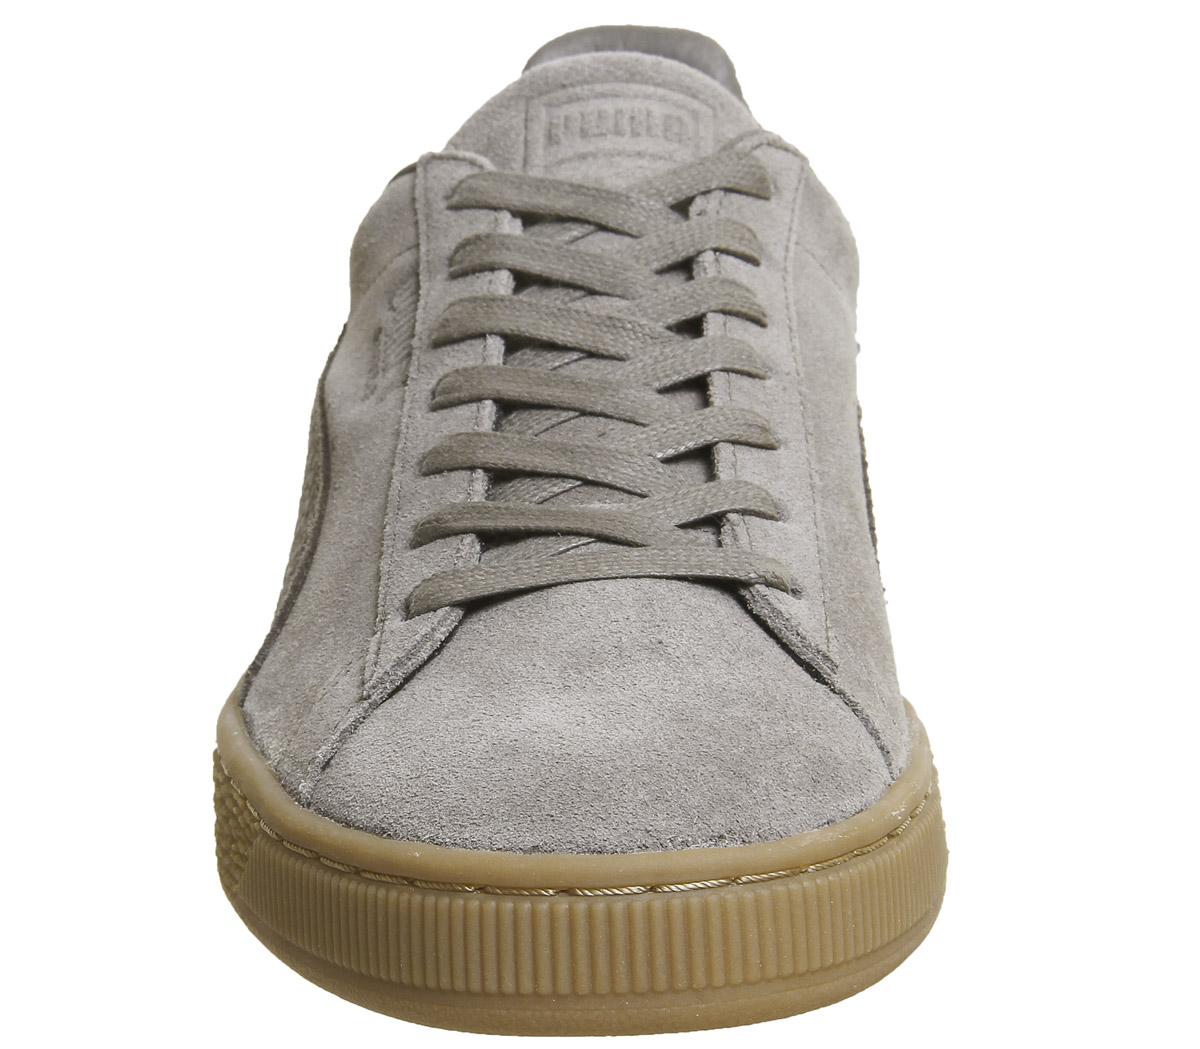 d4425d74a5e Sentinel Puma Suede Classic Trainers FALCON GUM Trainers Shoes